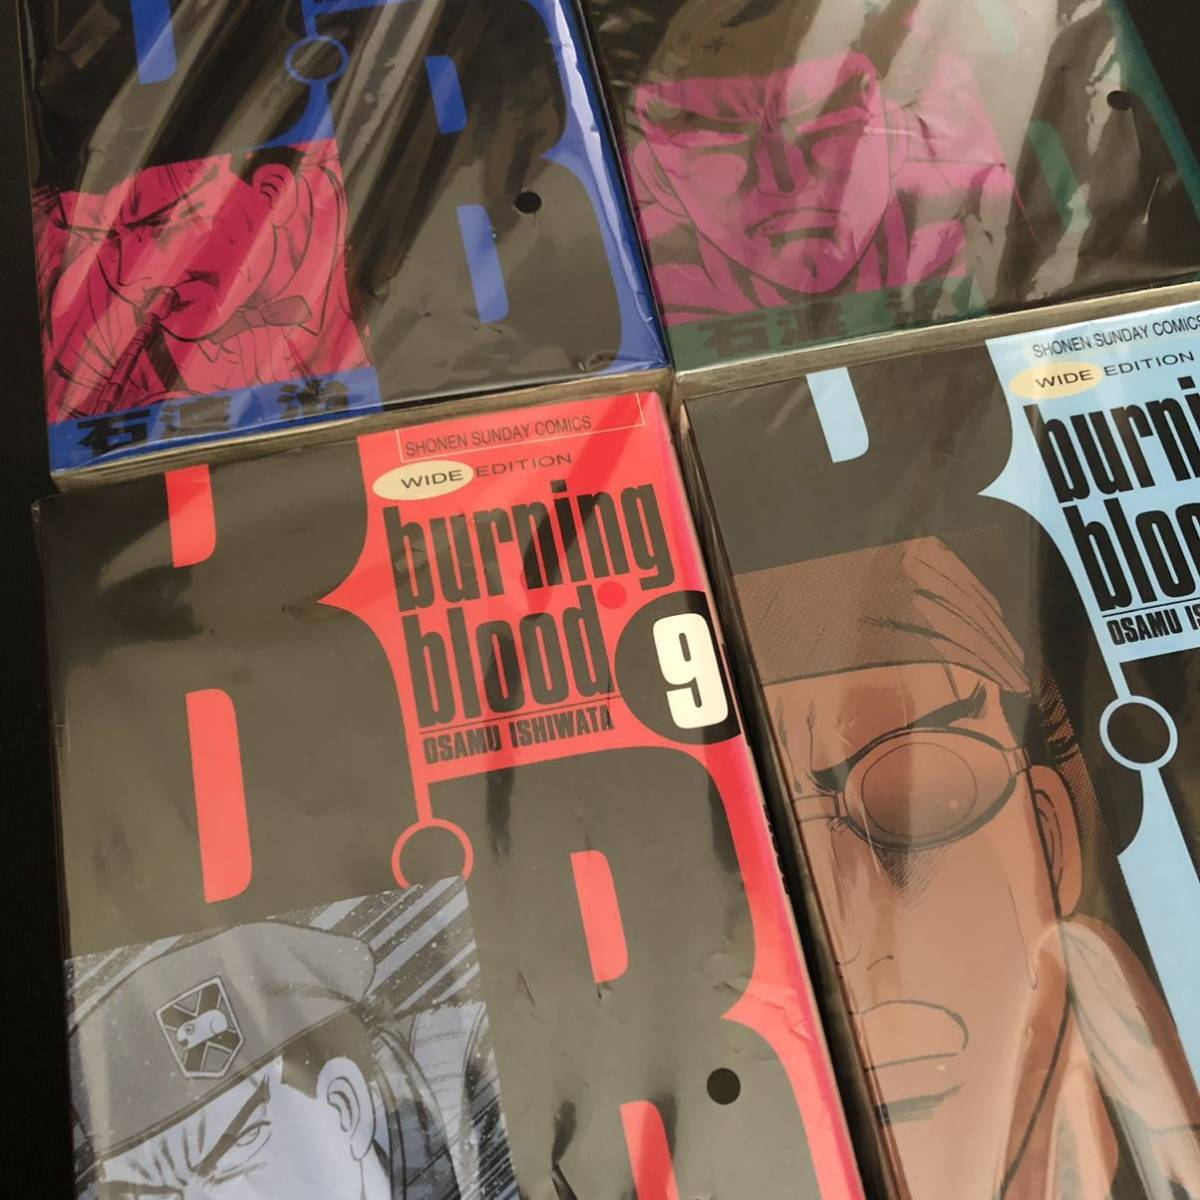 B・B burning blood 小学館コミックス ワイド版 石渡治  1巻~16巻【全巻セット】_画像8